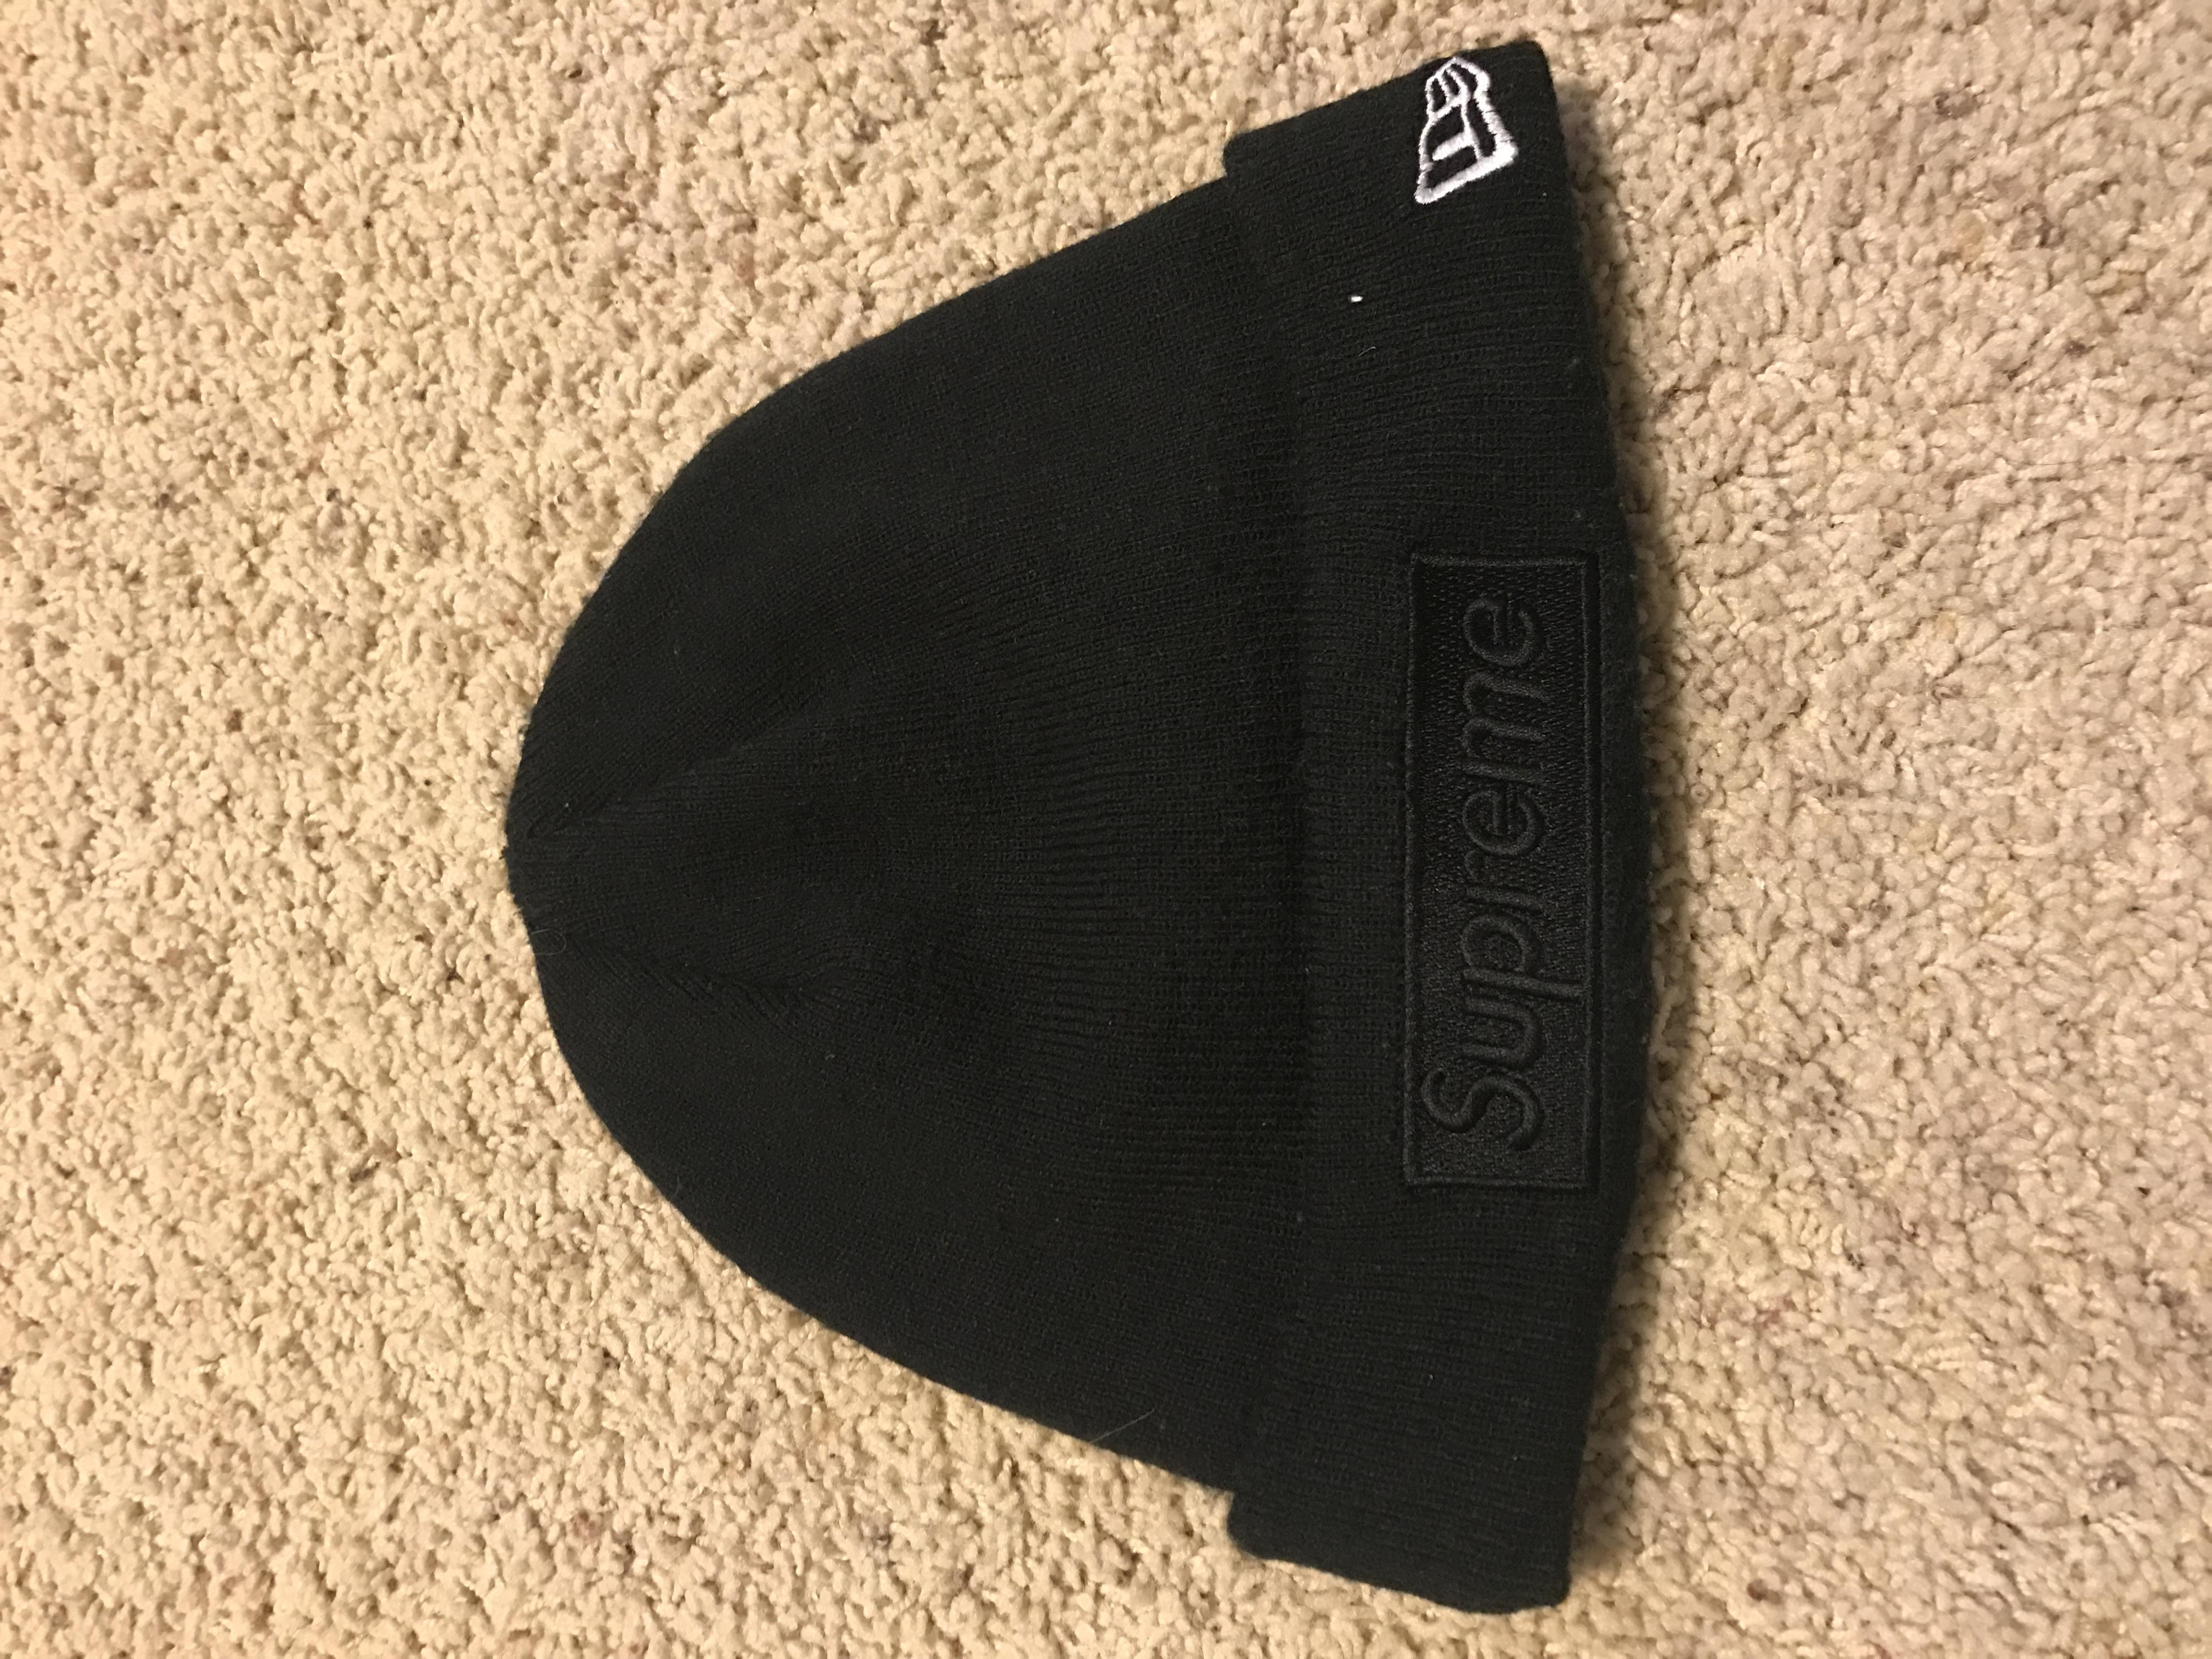 48cf88362c1 Supreme Supreme New Era Tonal Box Logo Beanie - Black Size one size ...